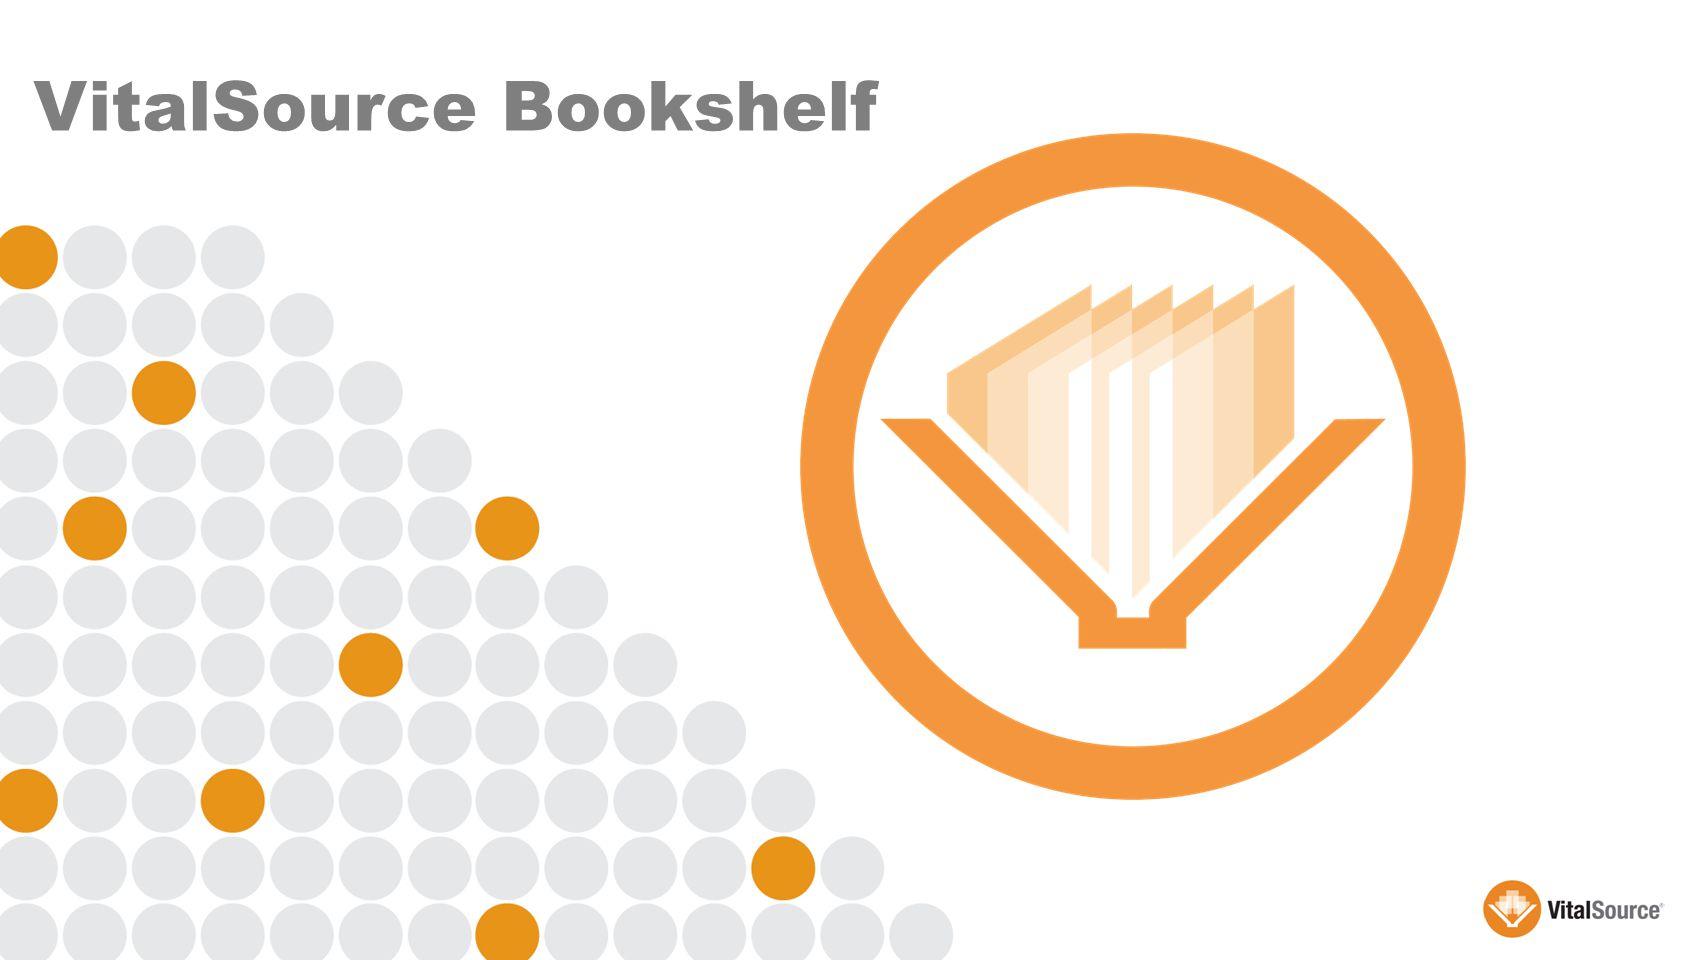 VitalSource Bookshelf